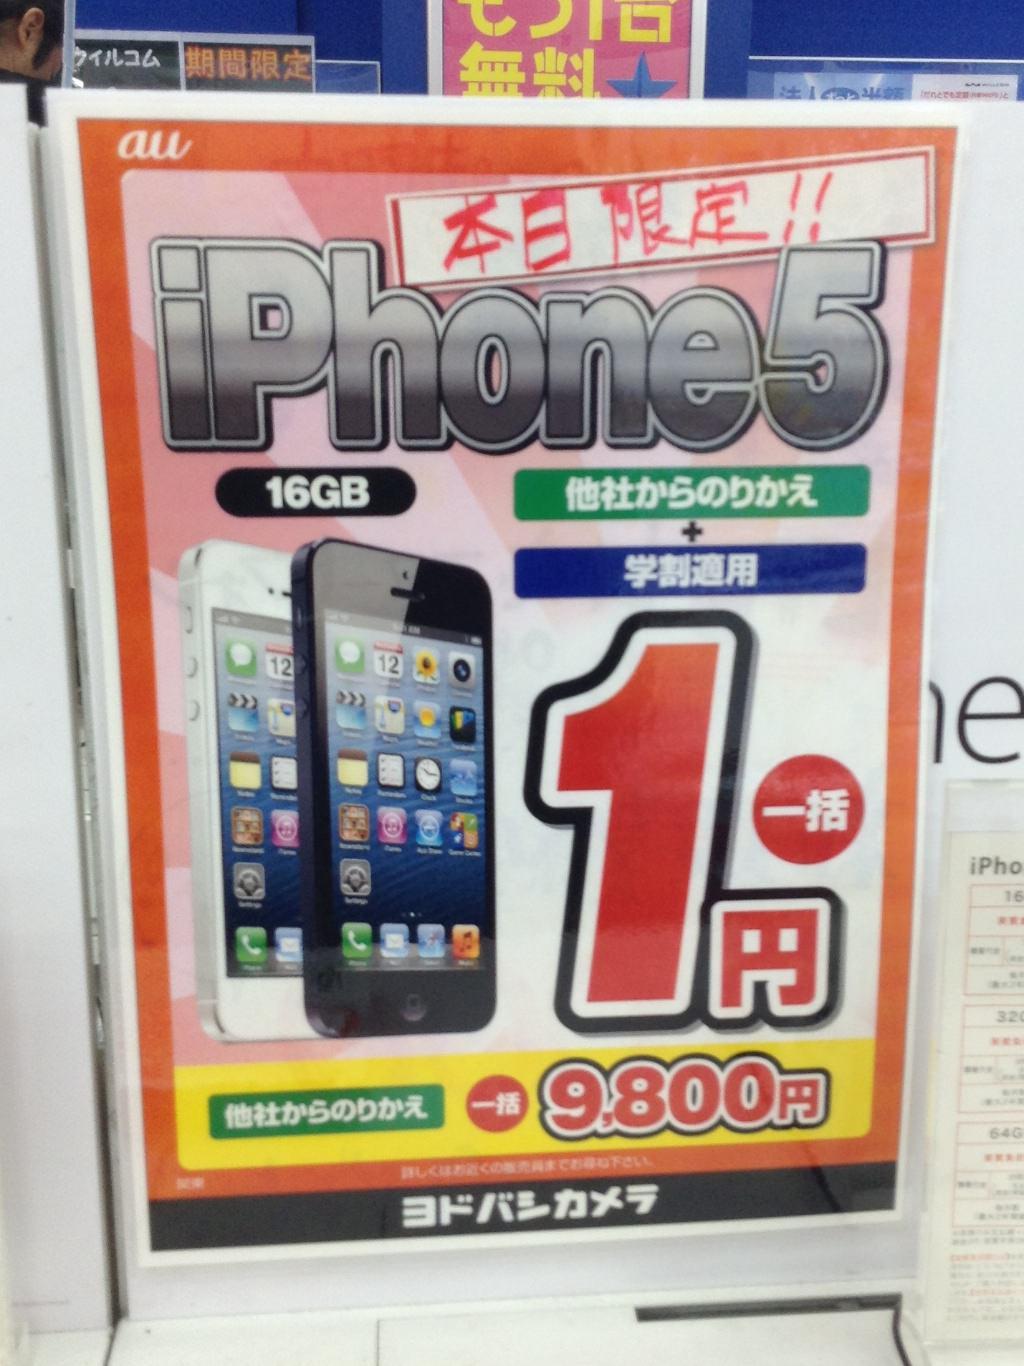 au iPhone 5の投げ売りはヨドバシのタイムセールを利用するとさらにおトク